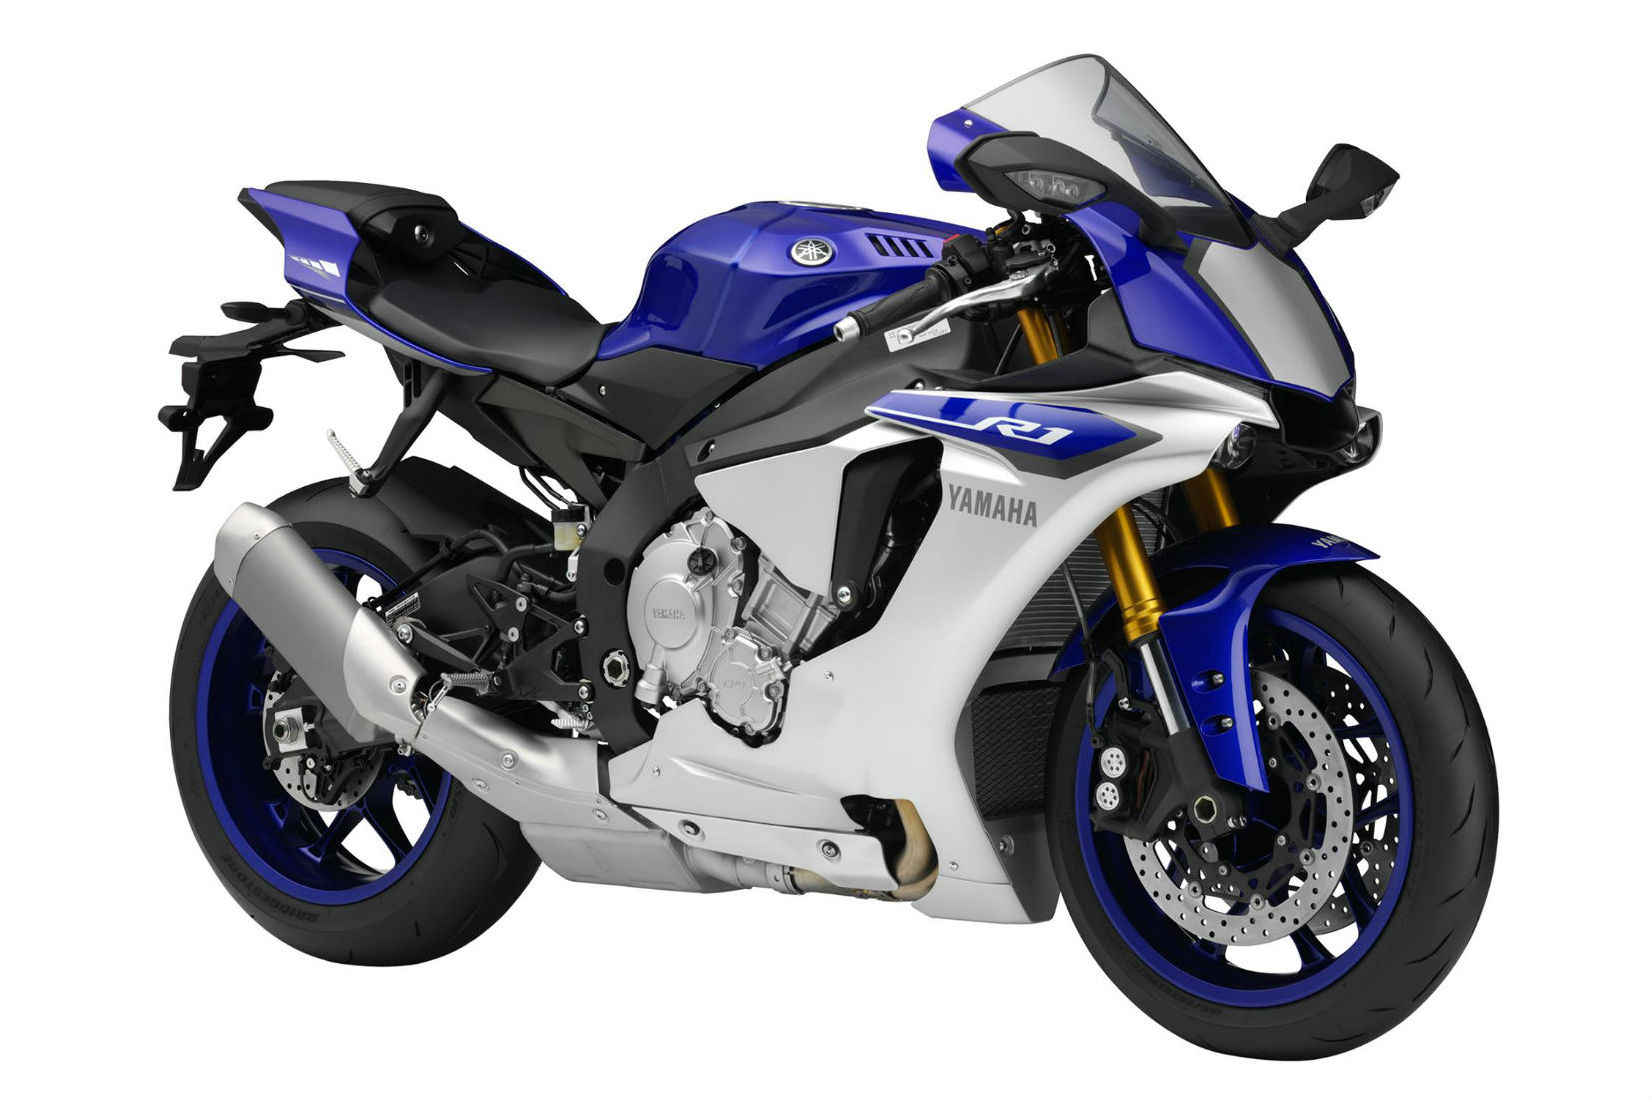 Where's the Yamaha R1S, then?